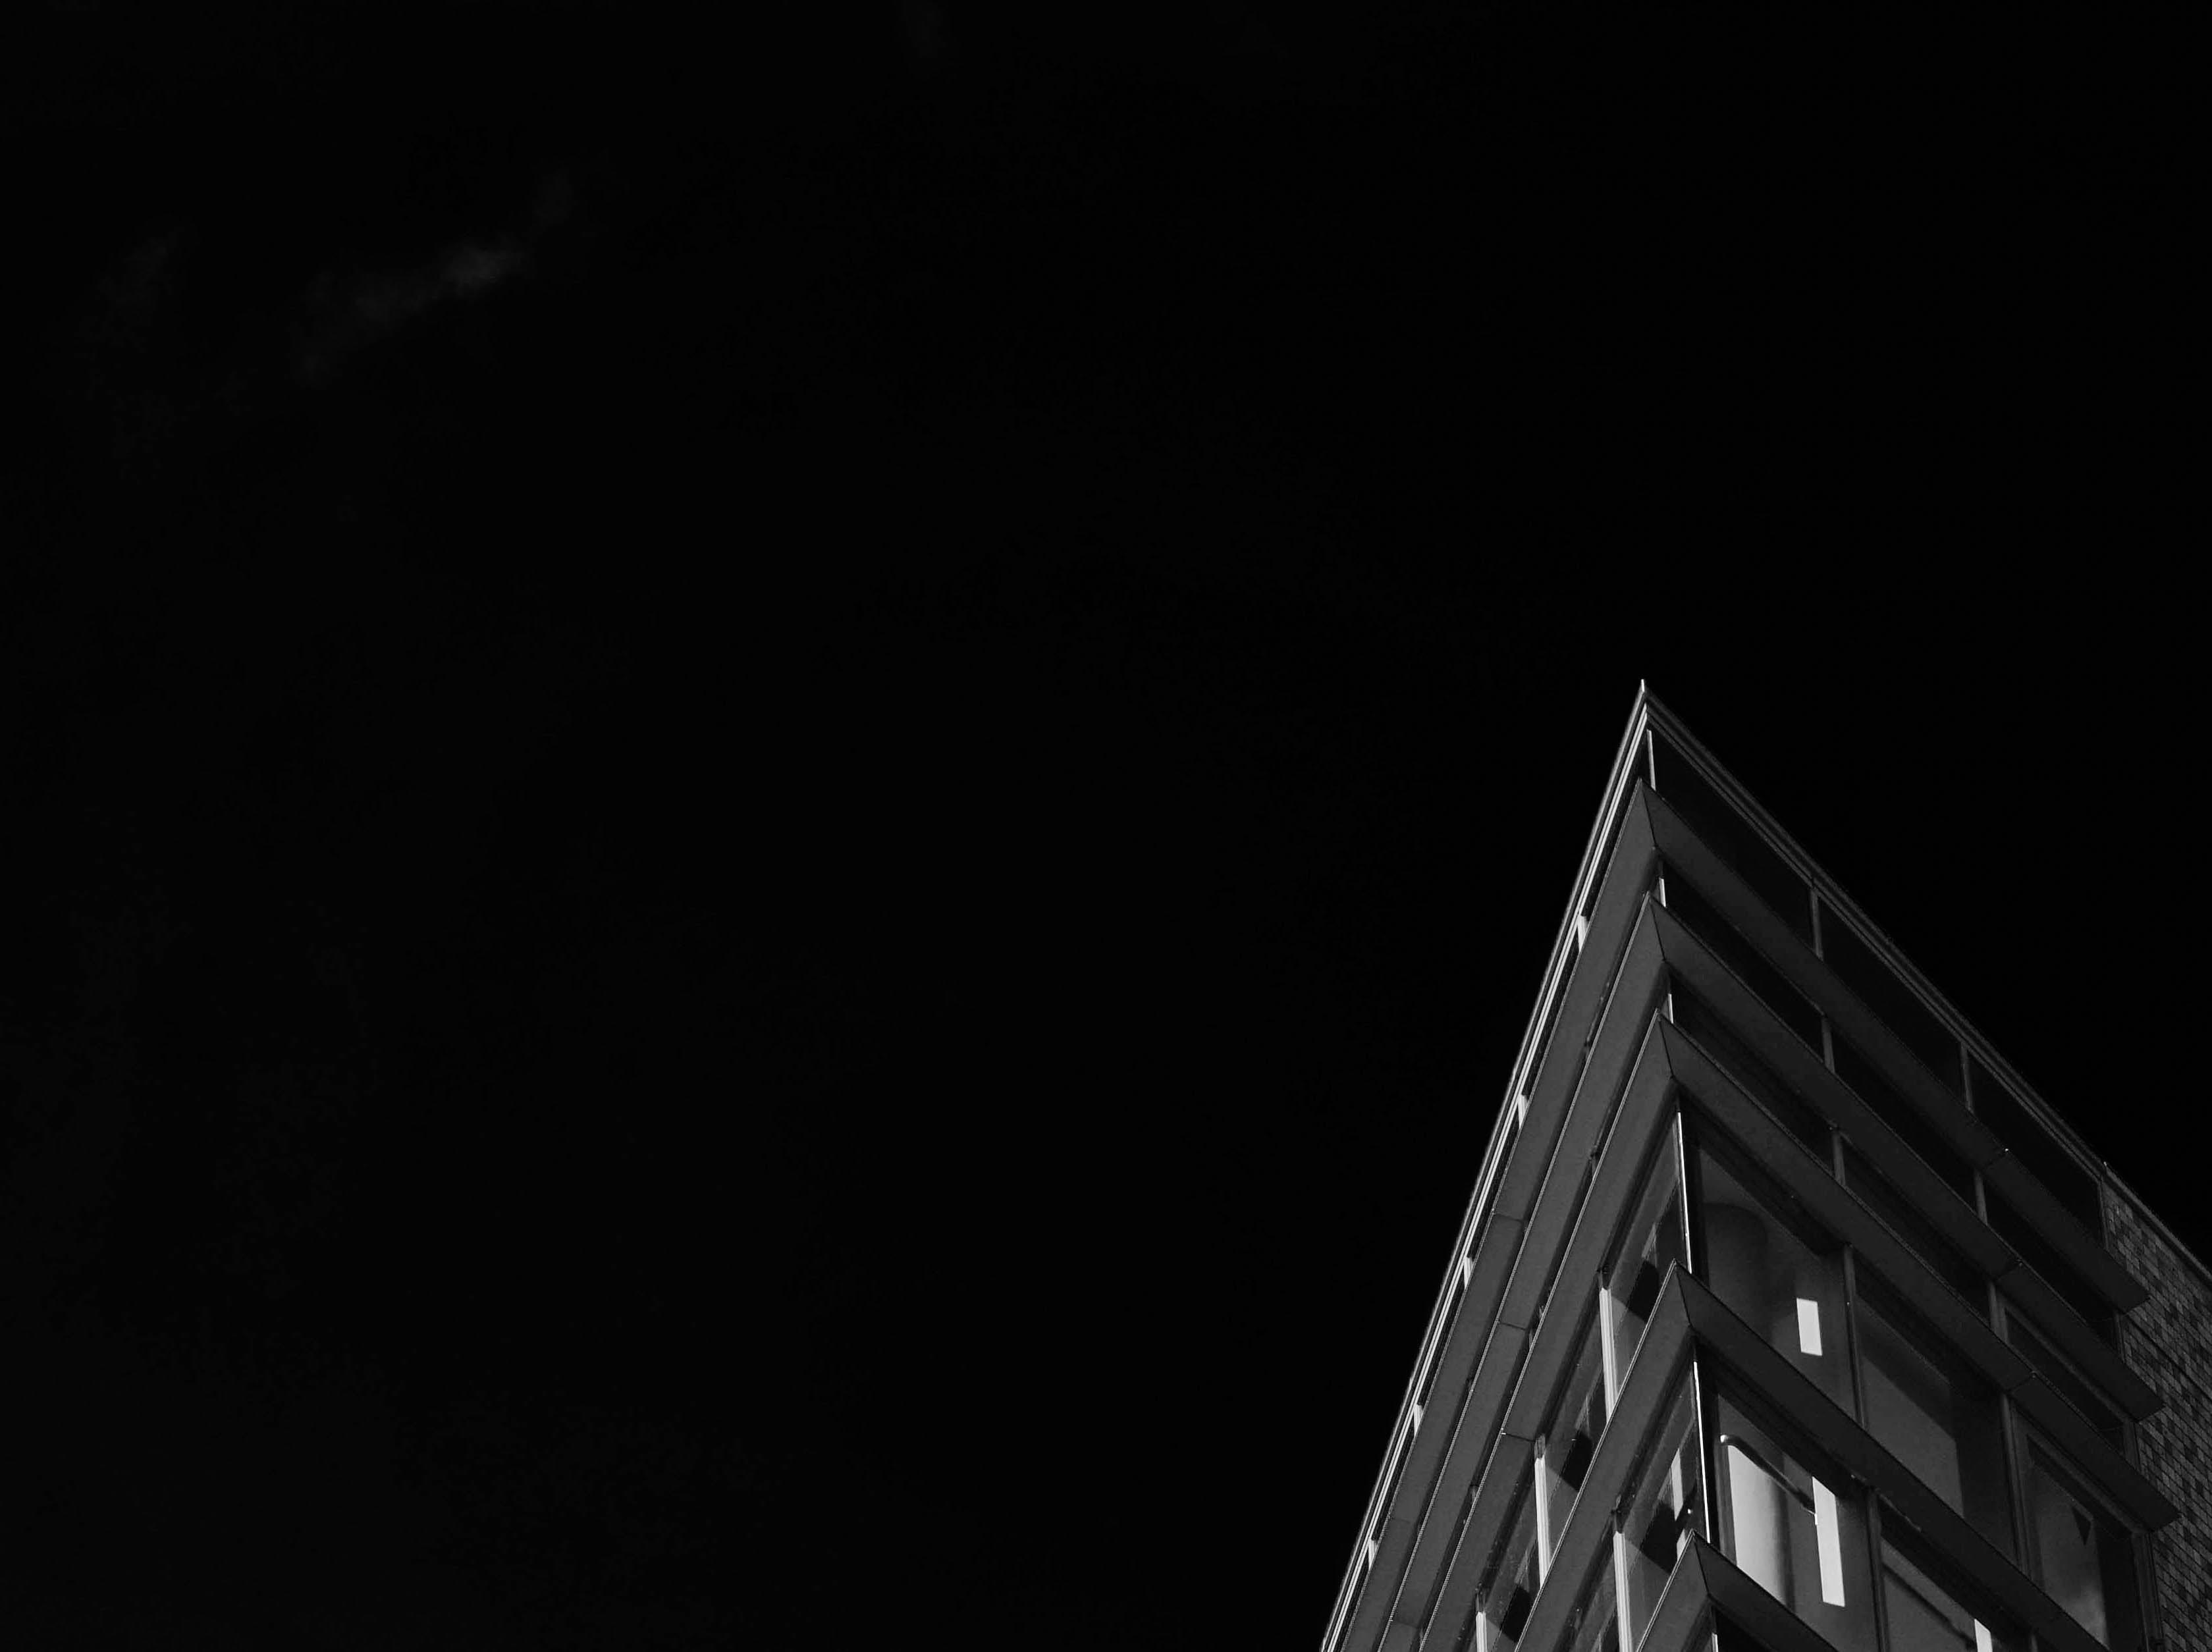 gray concrete building under night sky